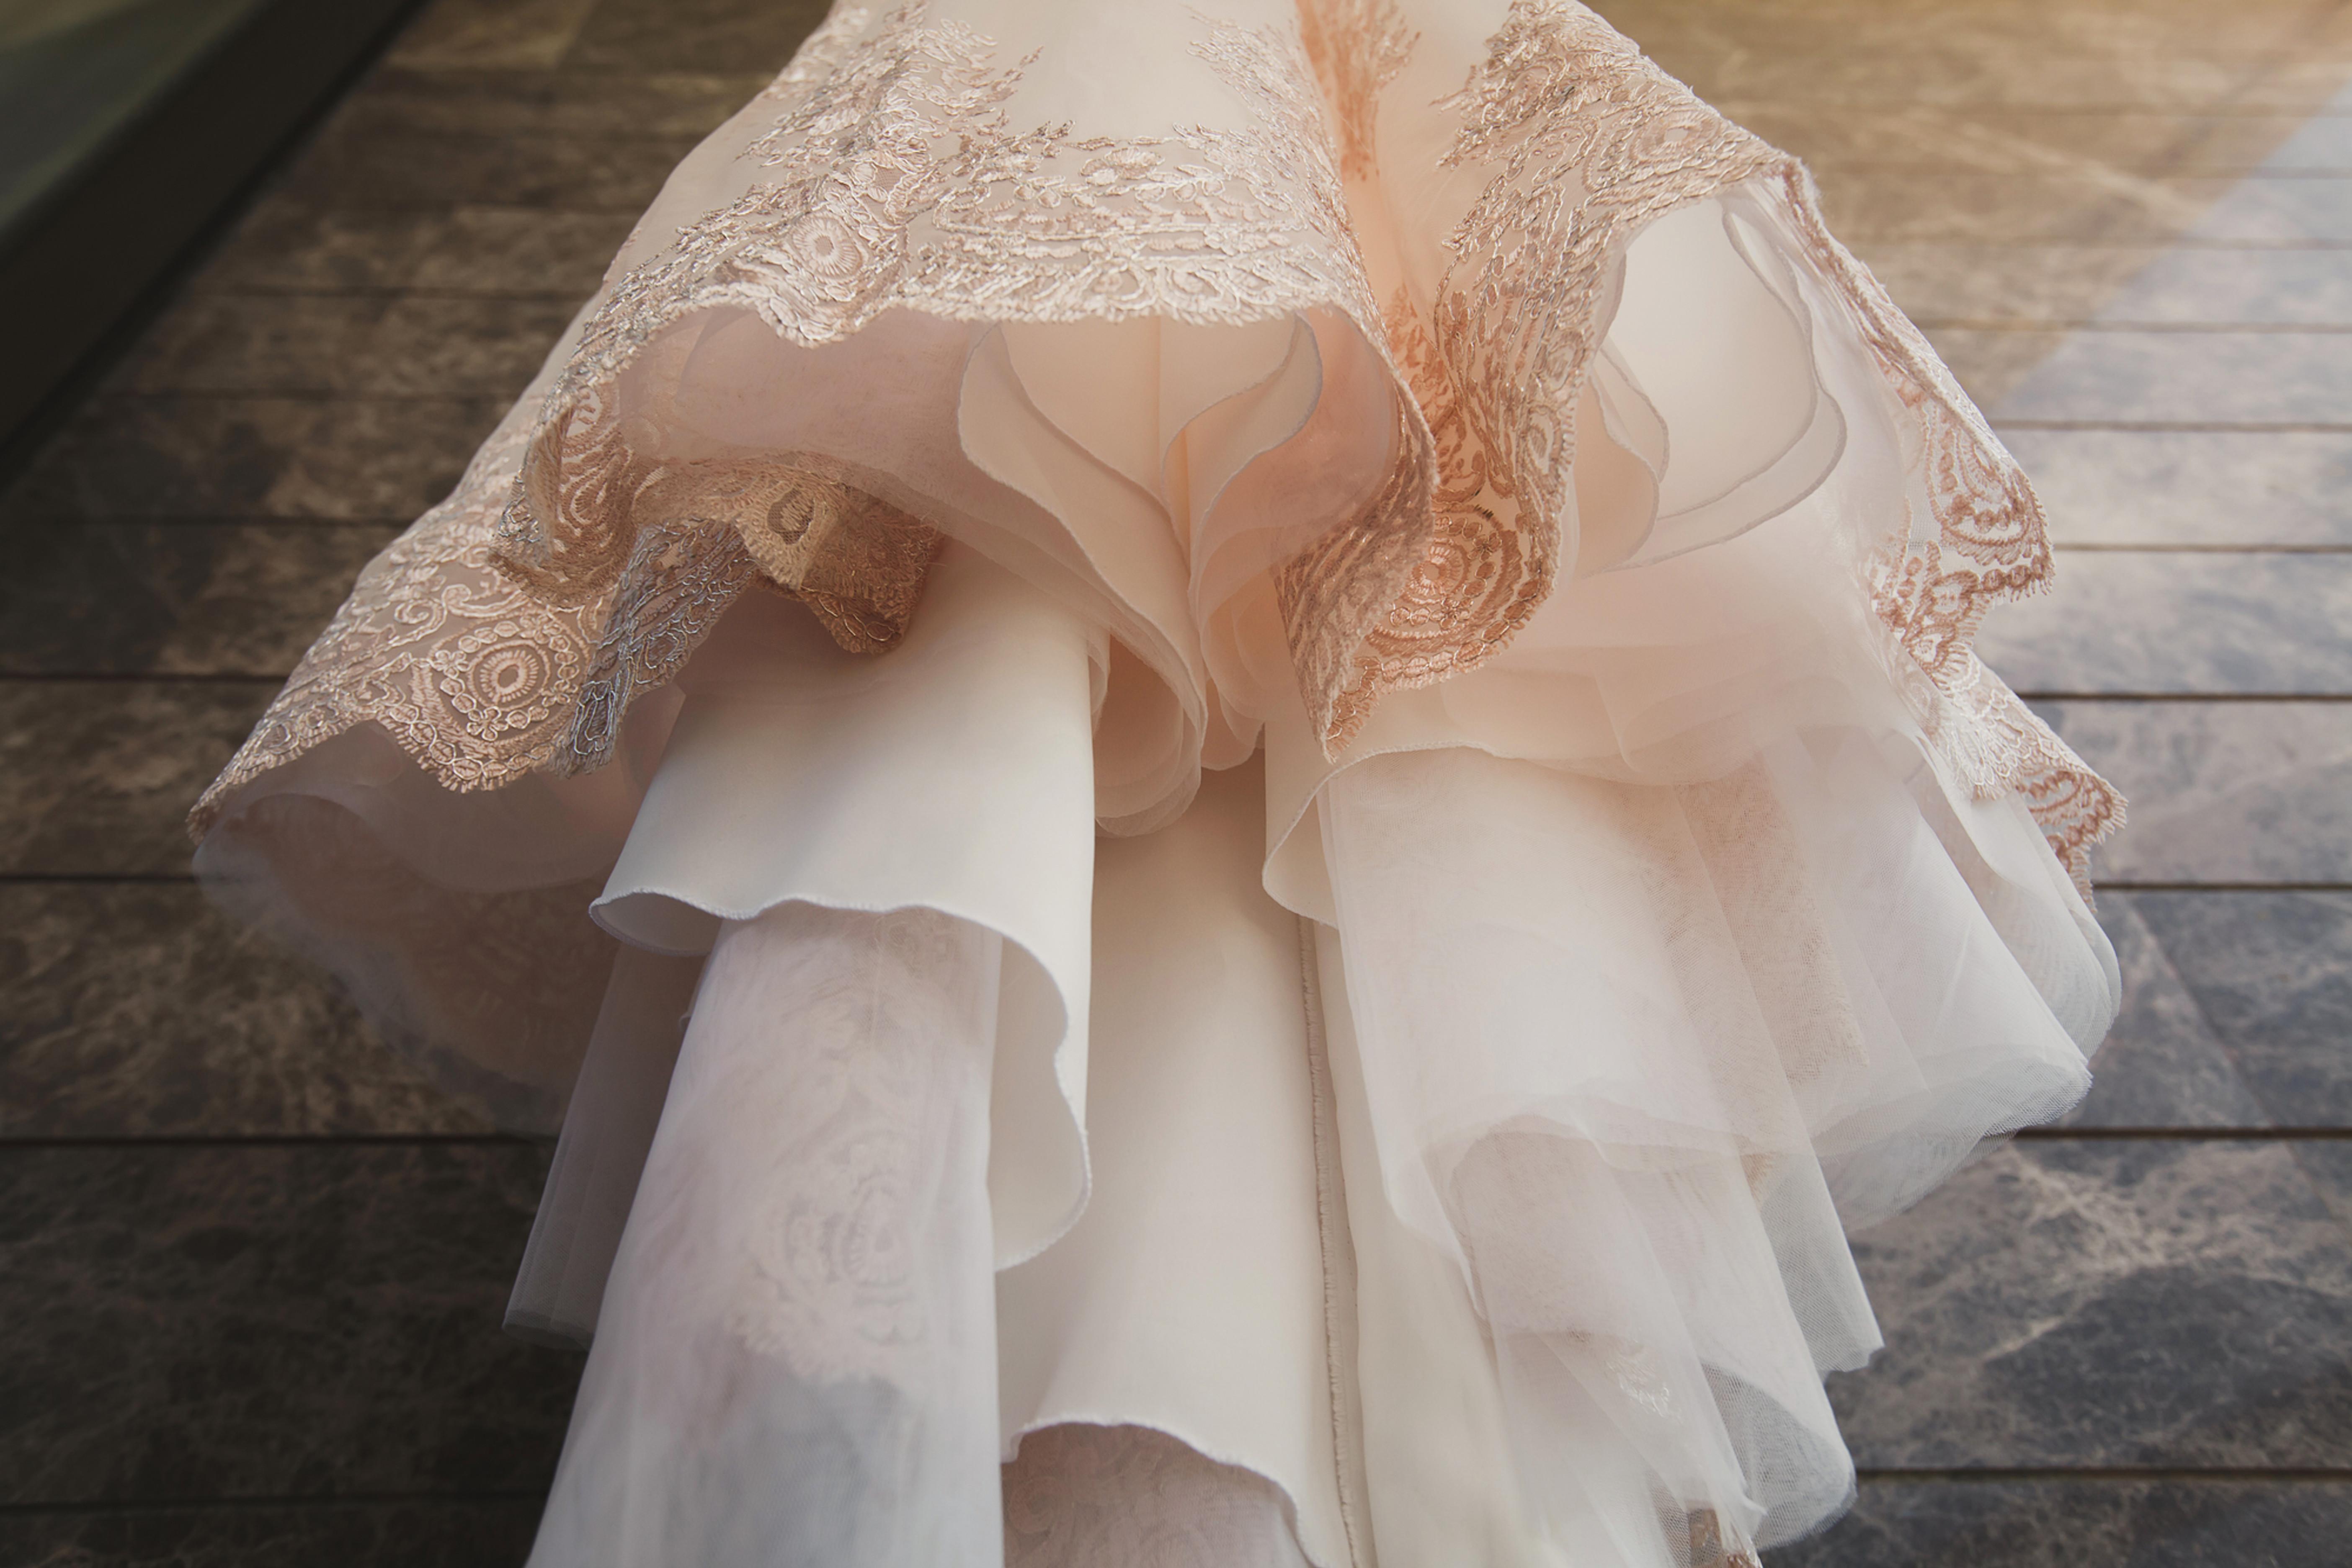 Hemming Dress